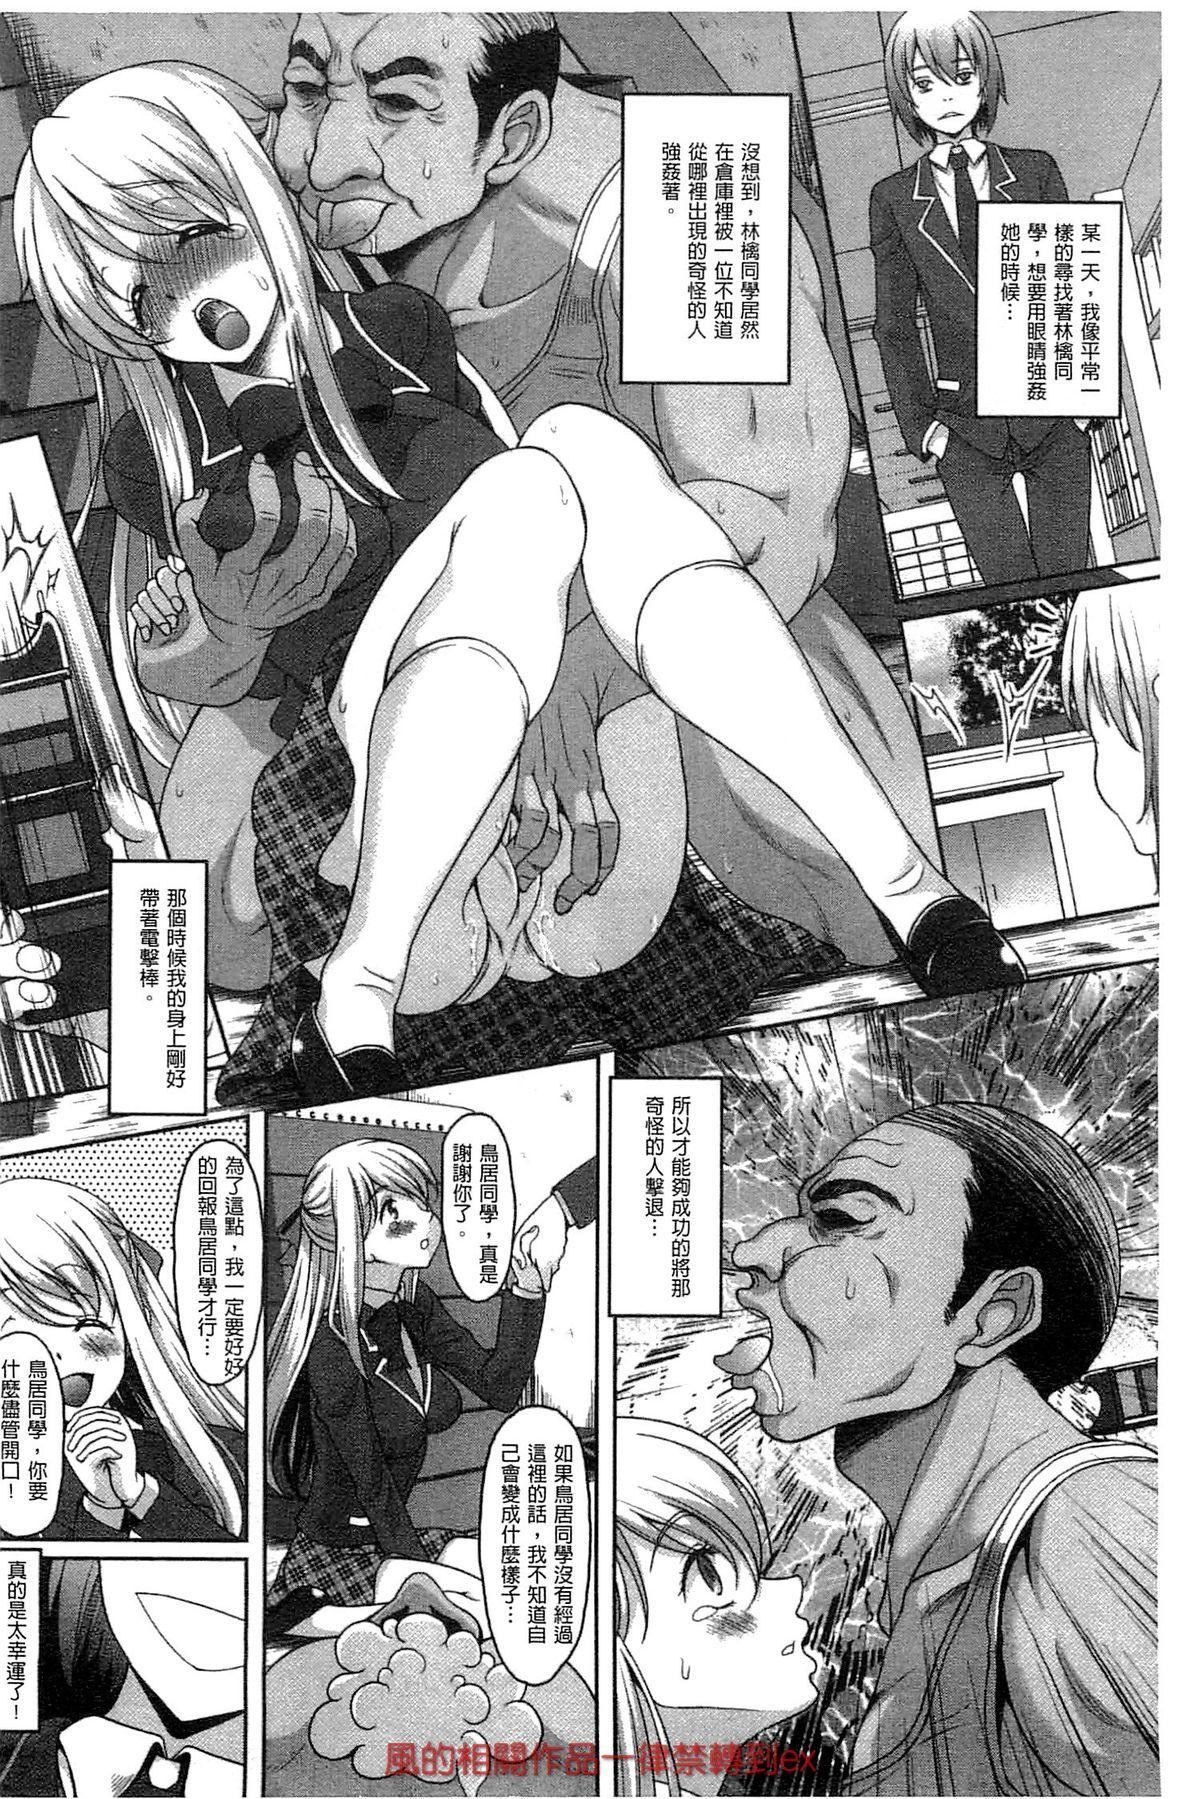 Hajimete nan da kara 31